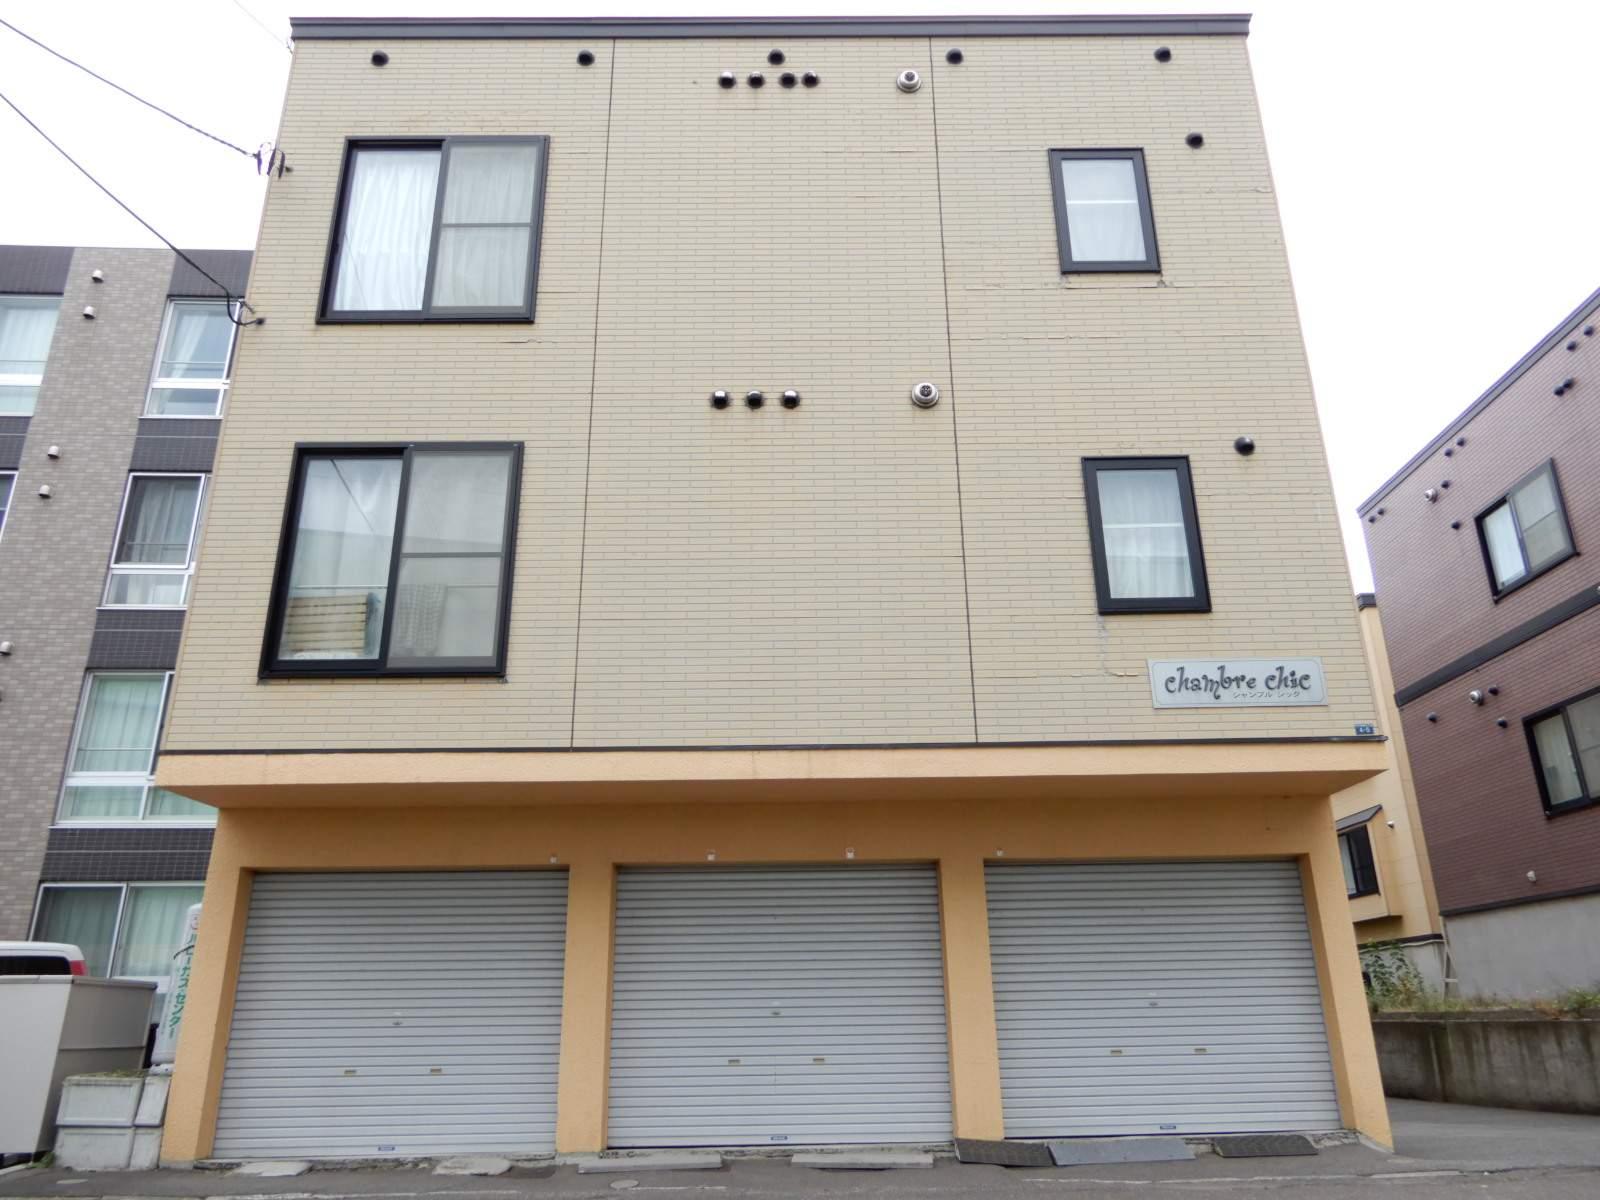 北海道札幌市東区、環状通東駅徒歩6分の築13年 3階建の賃貸アパート